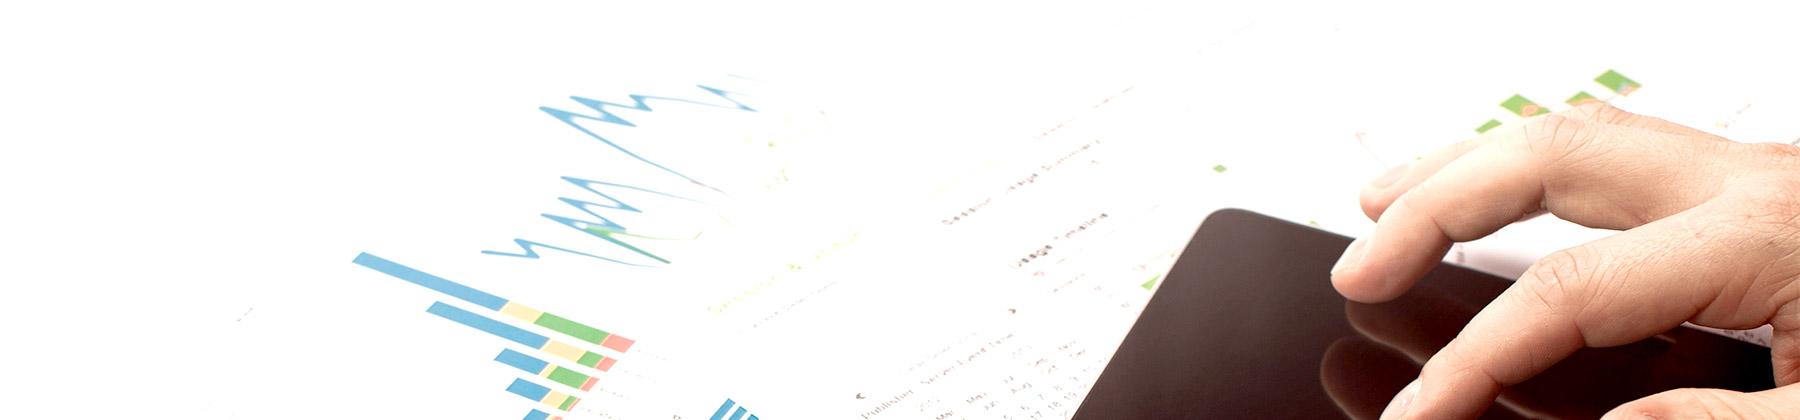 bg_ipad-paperchart